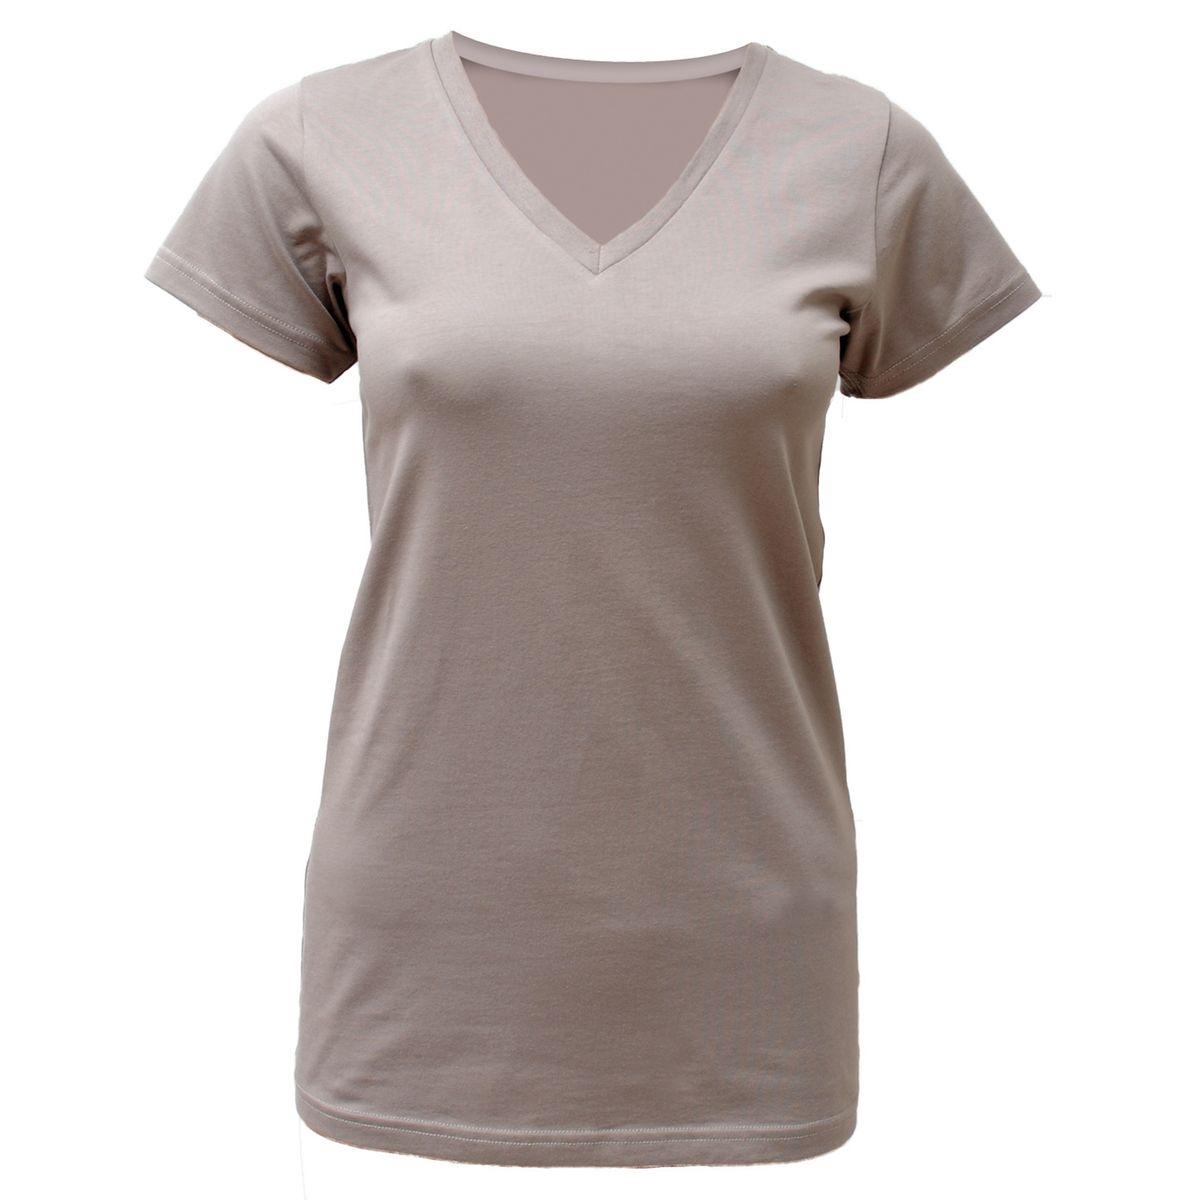 Yoga-T-Shirt  Snake  - taupe taupe